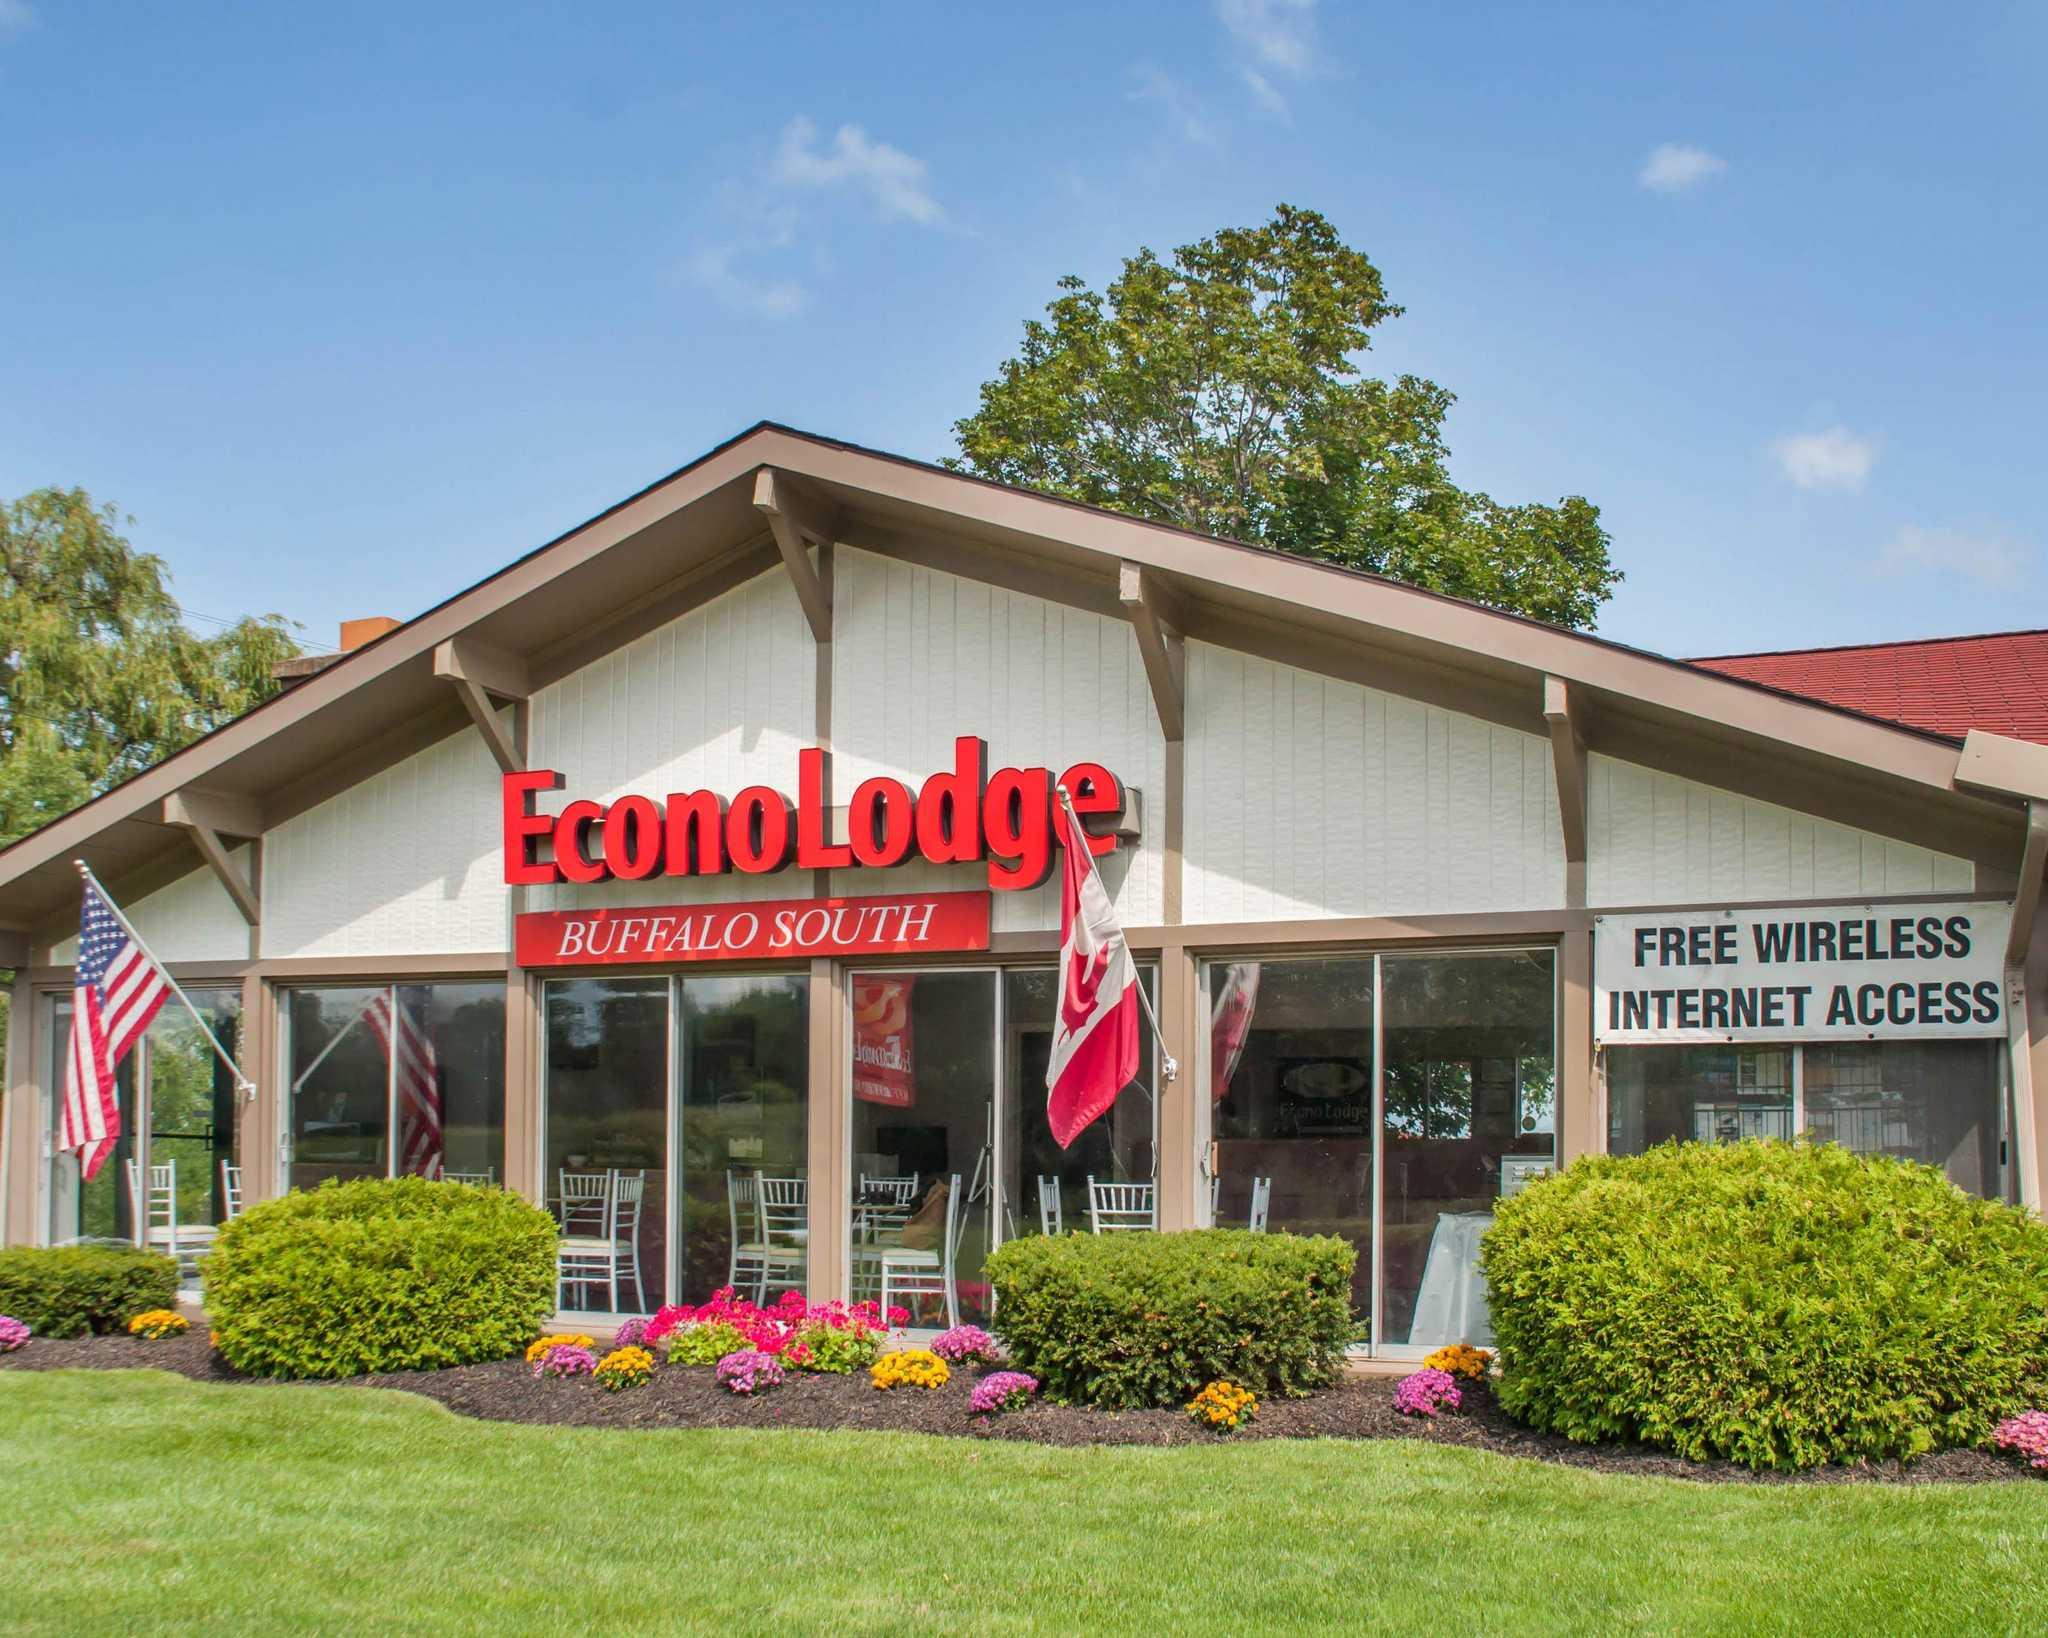 Econo Lodge Buffalo South image 1